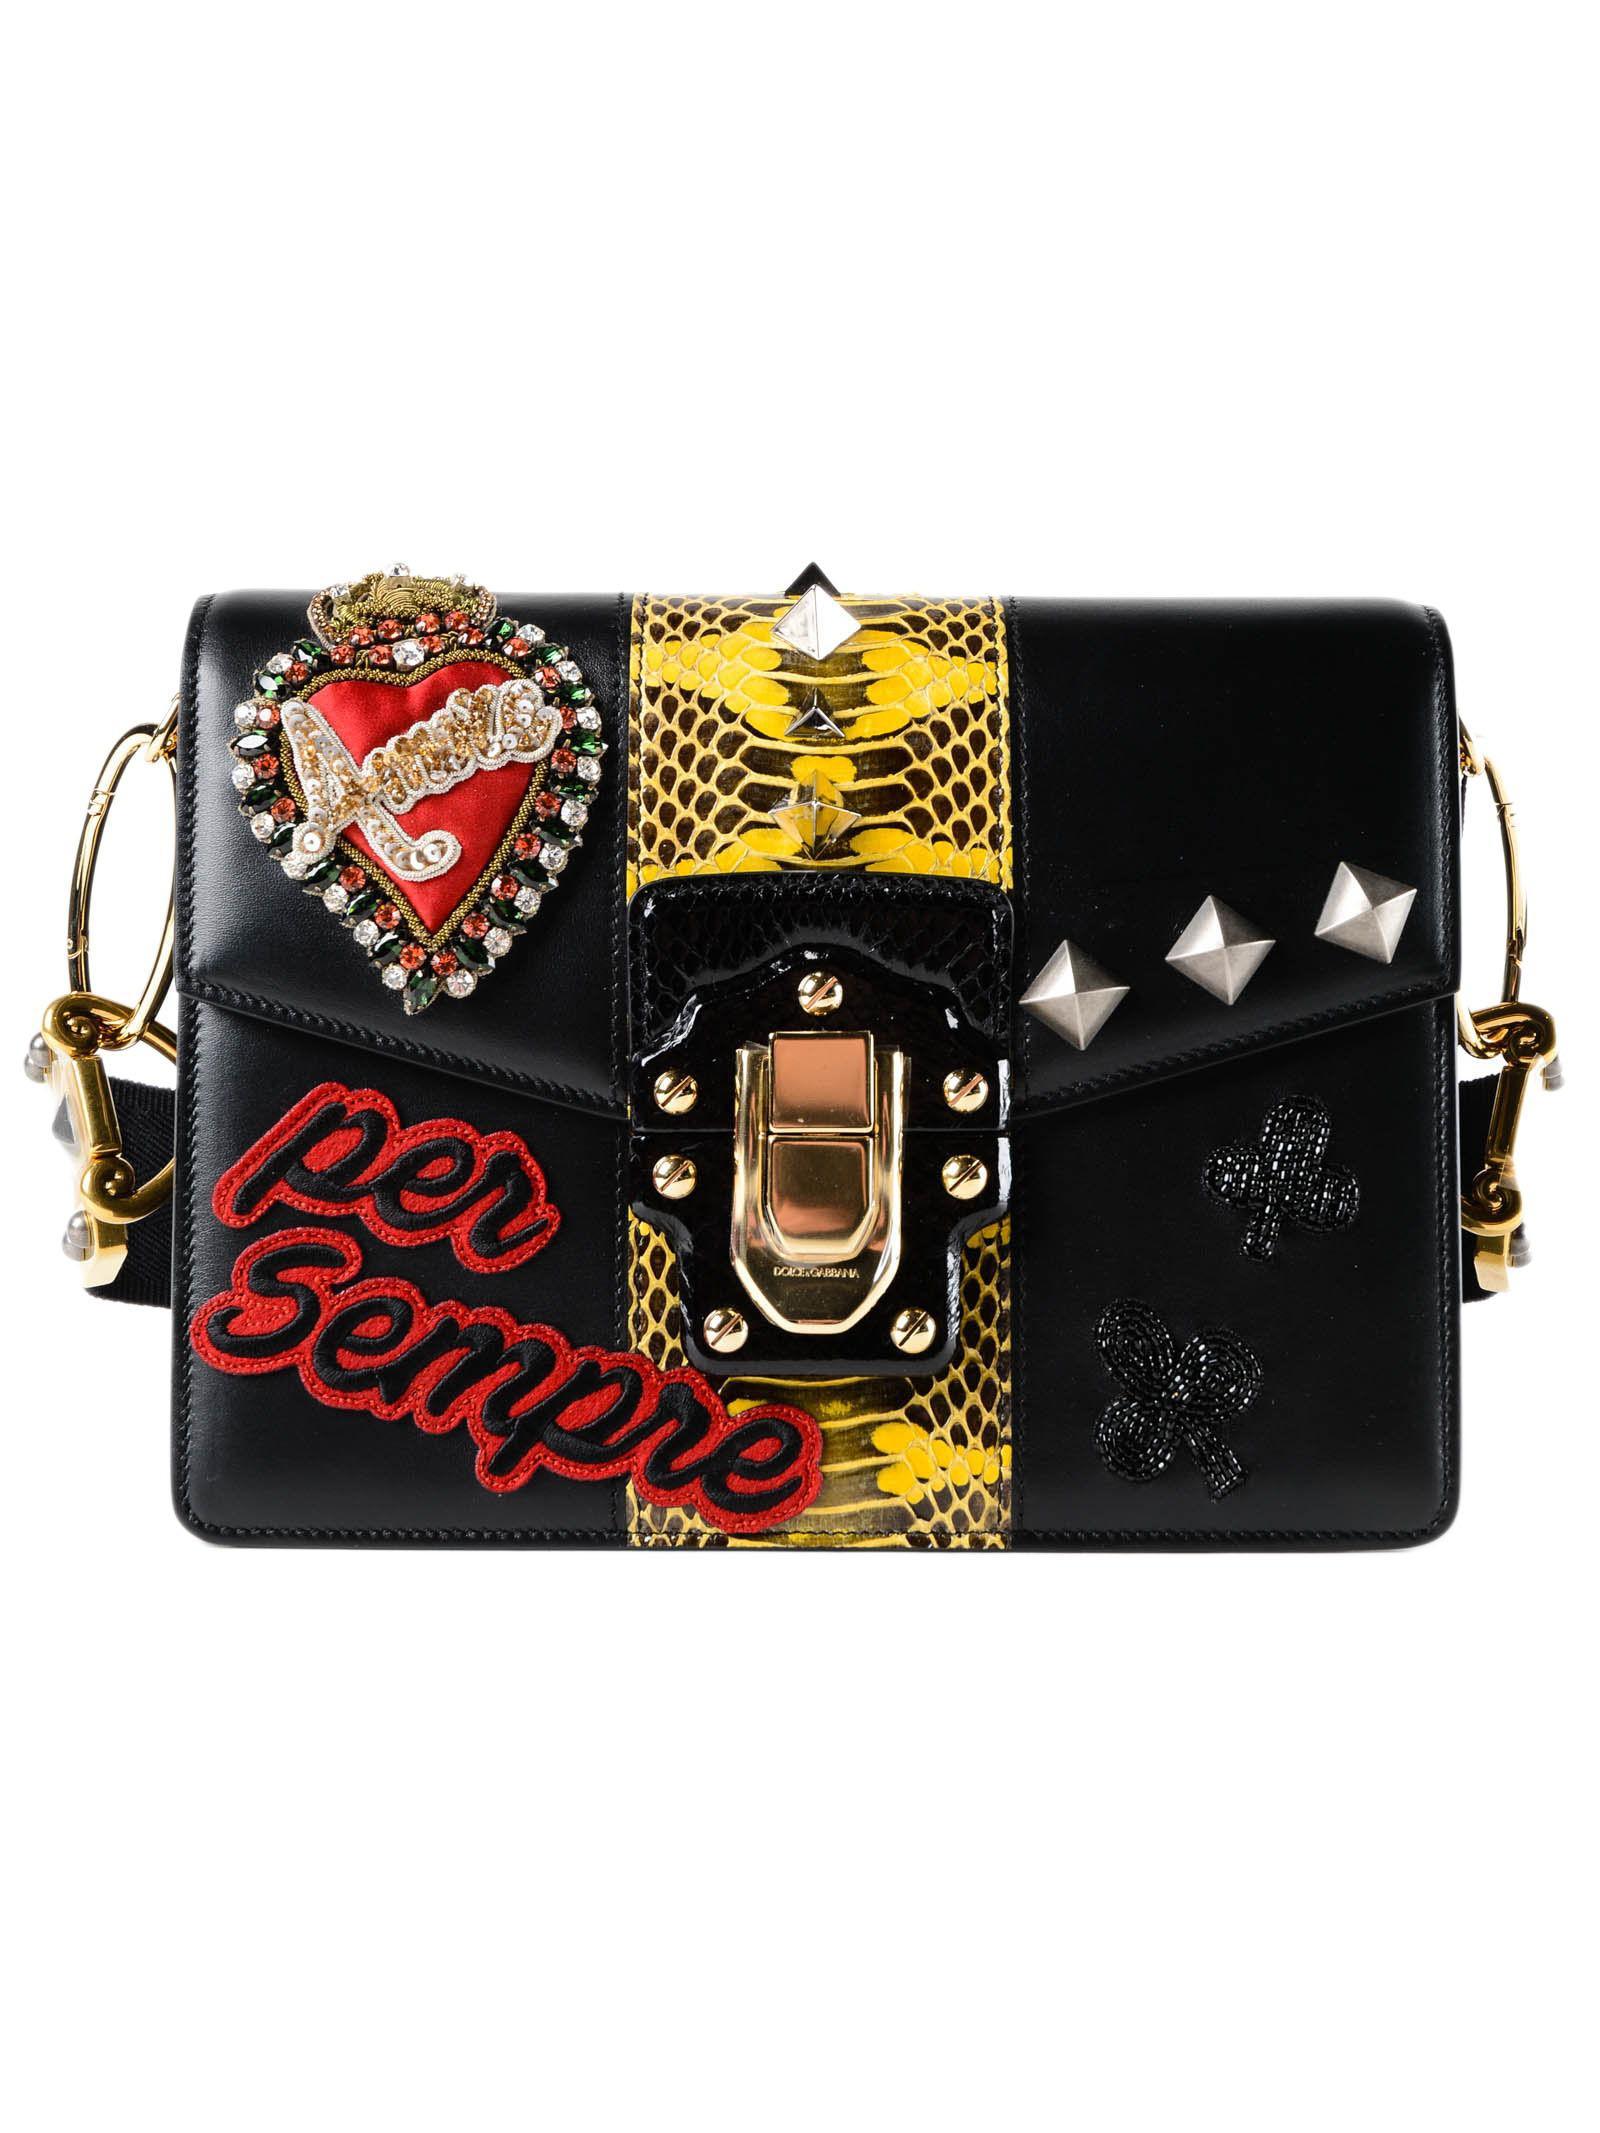 c8e152e89c Dolce   Gabbana Calfskin Printed Shoulder Bag - Lyst